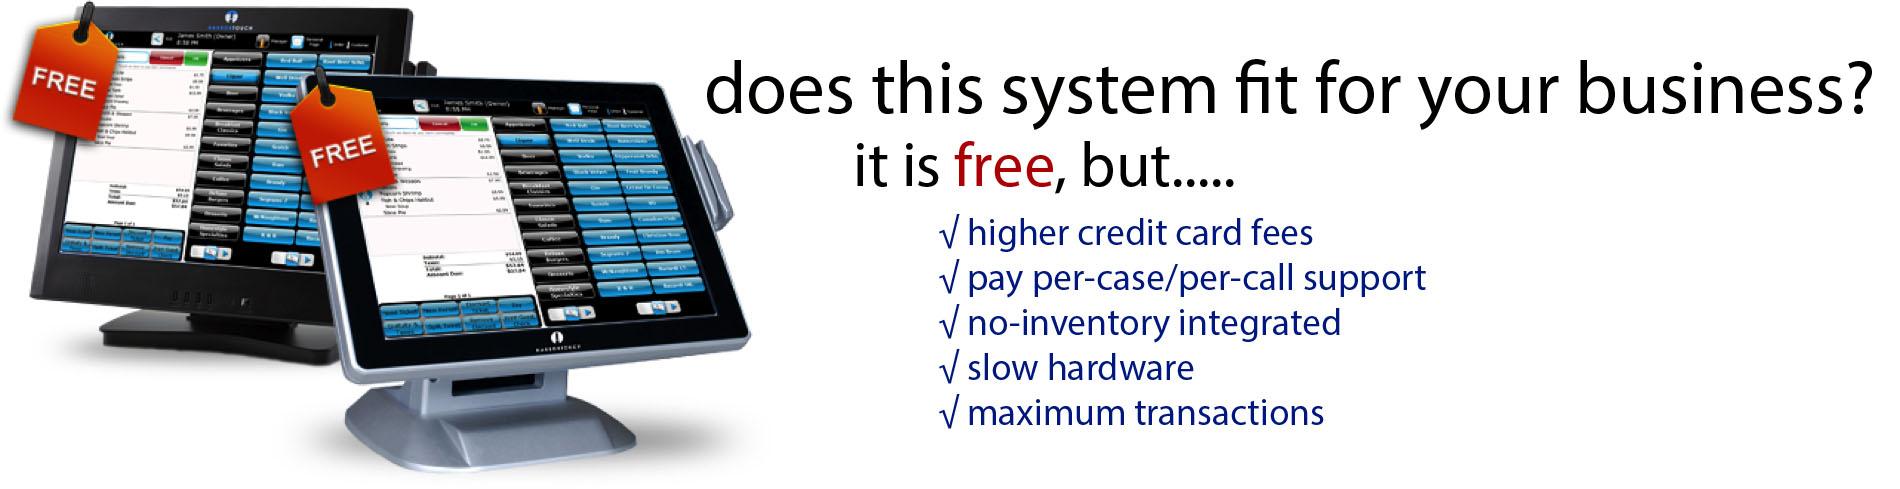 Switch your POS now | spoonadvisor com